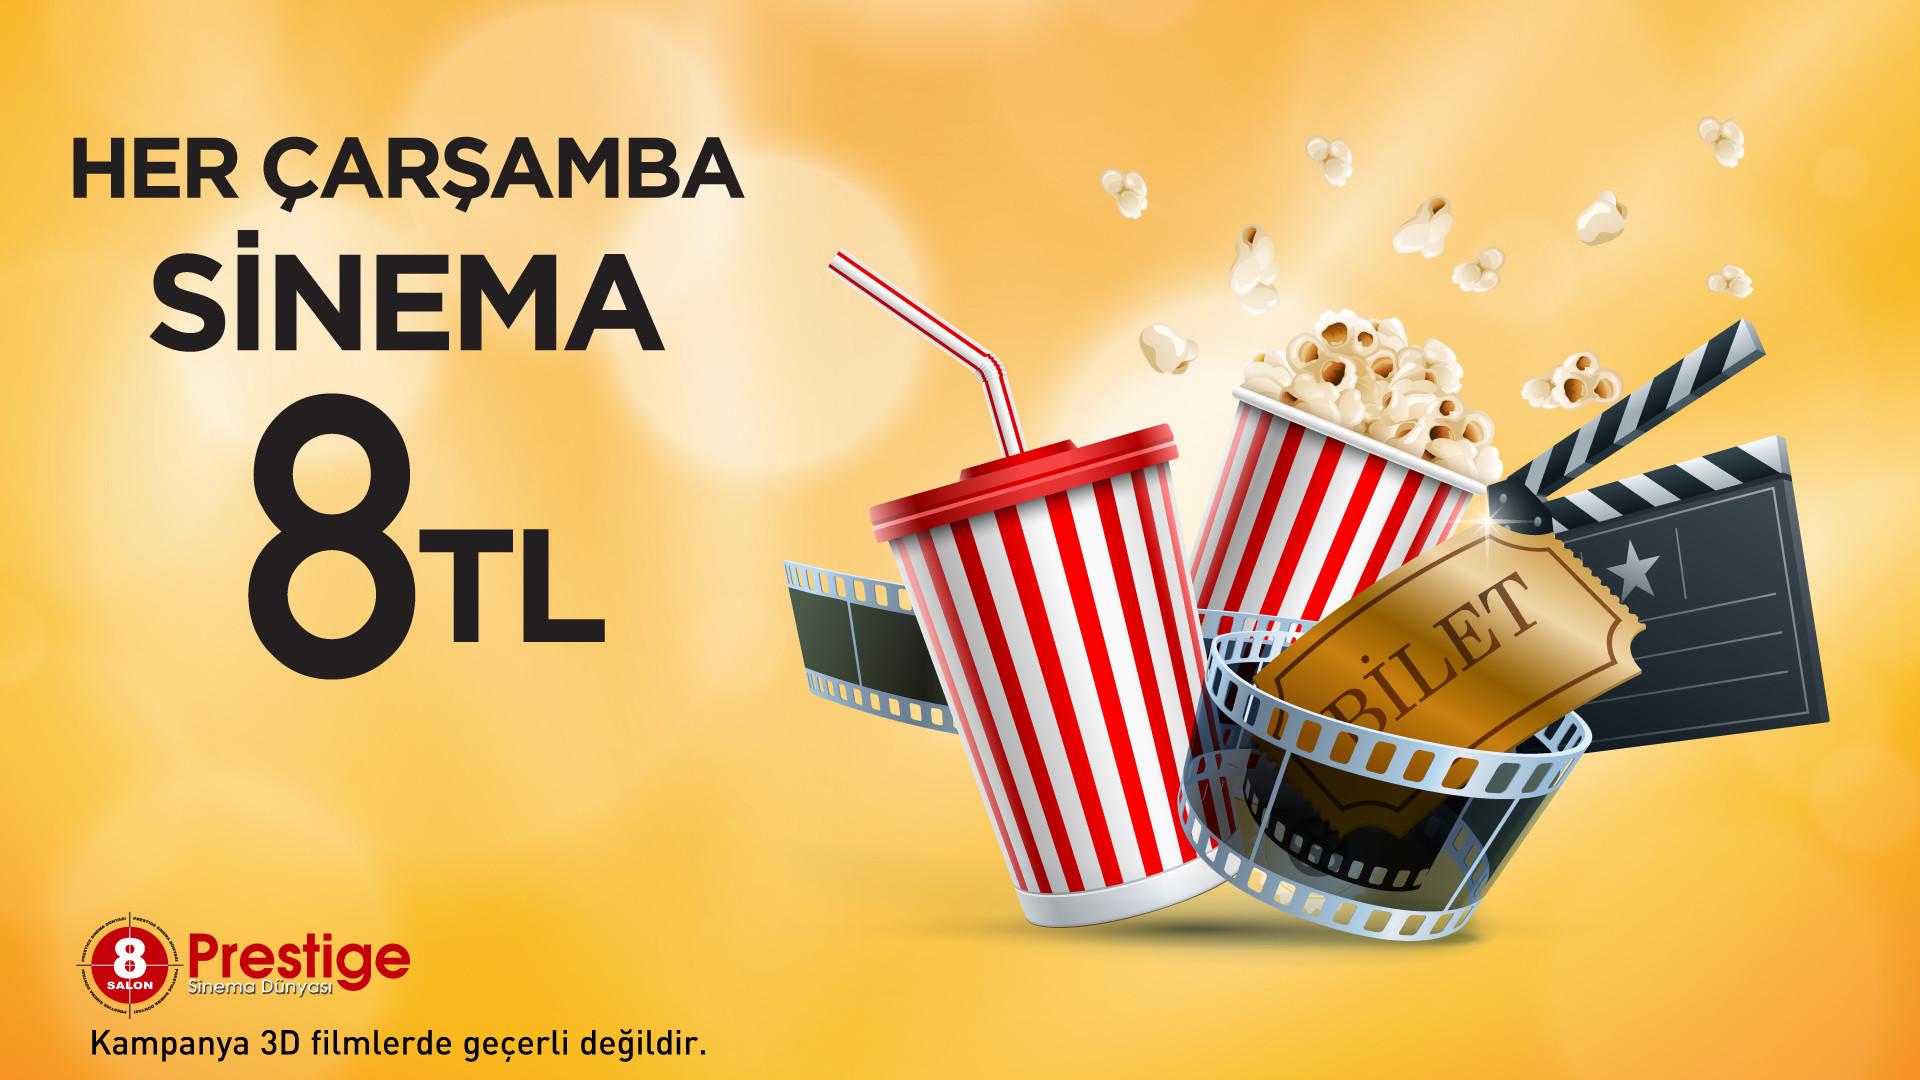 Her Çarşamba Sinema 8 TL